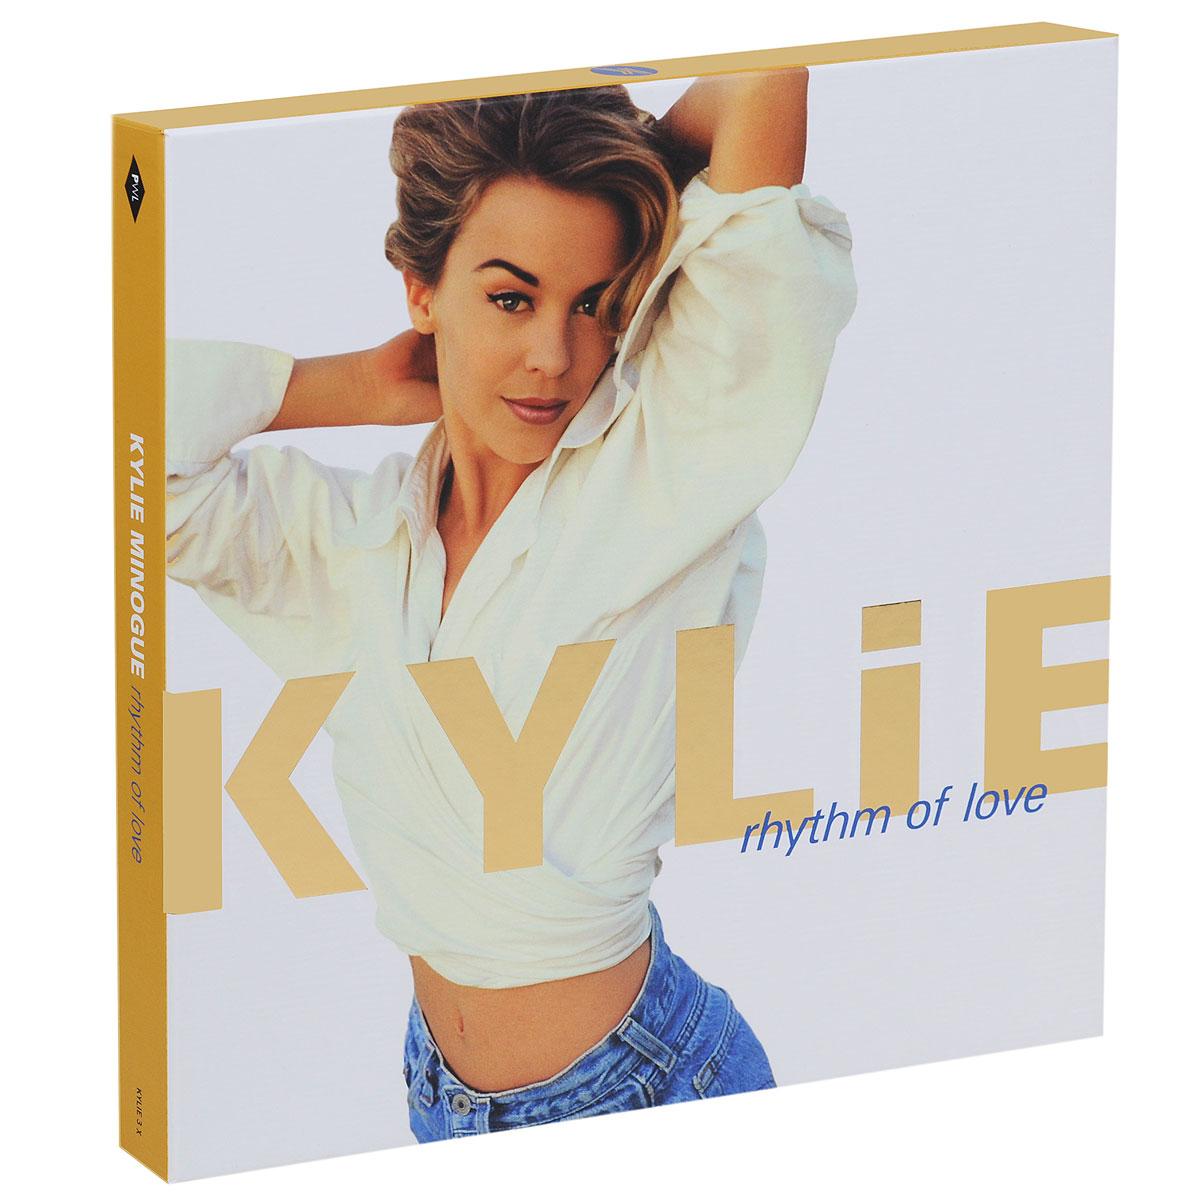 Kylie Minogue. Rhythm Of Love (2 CD + DVD + LP)